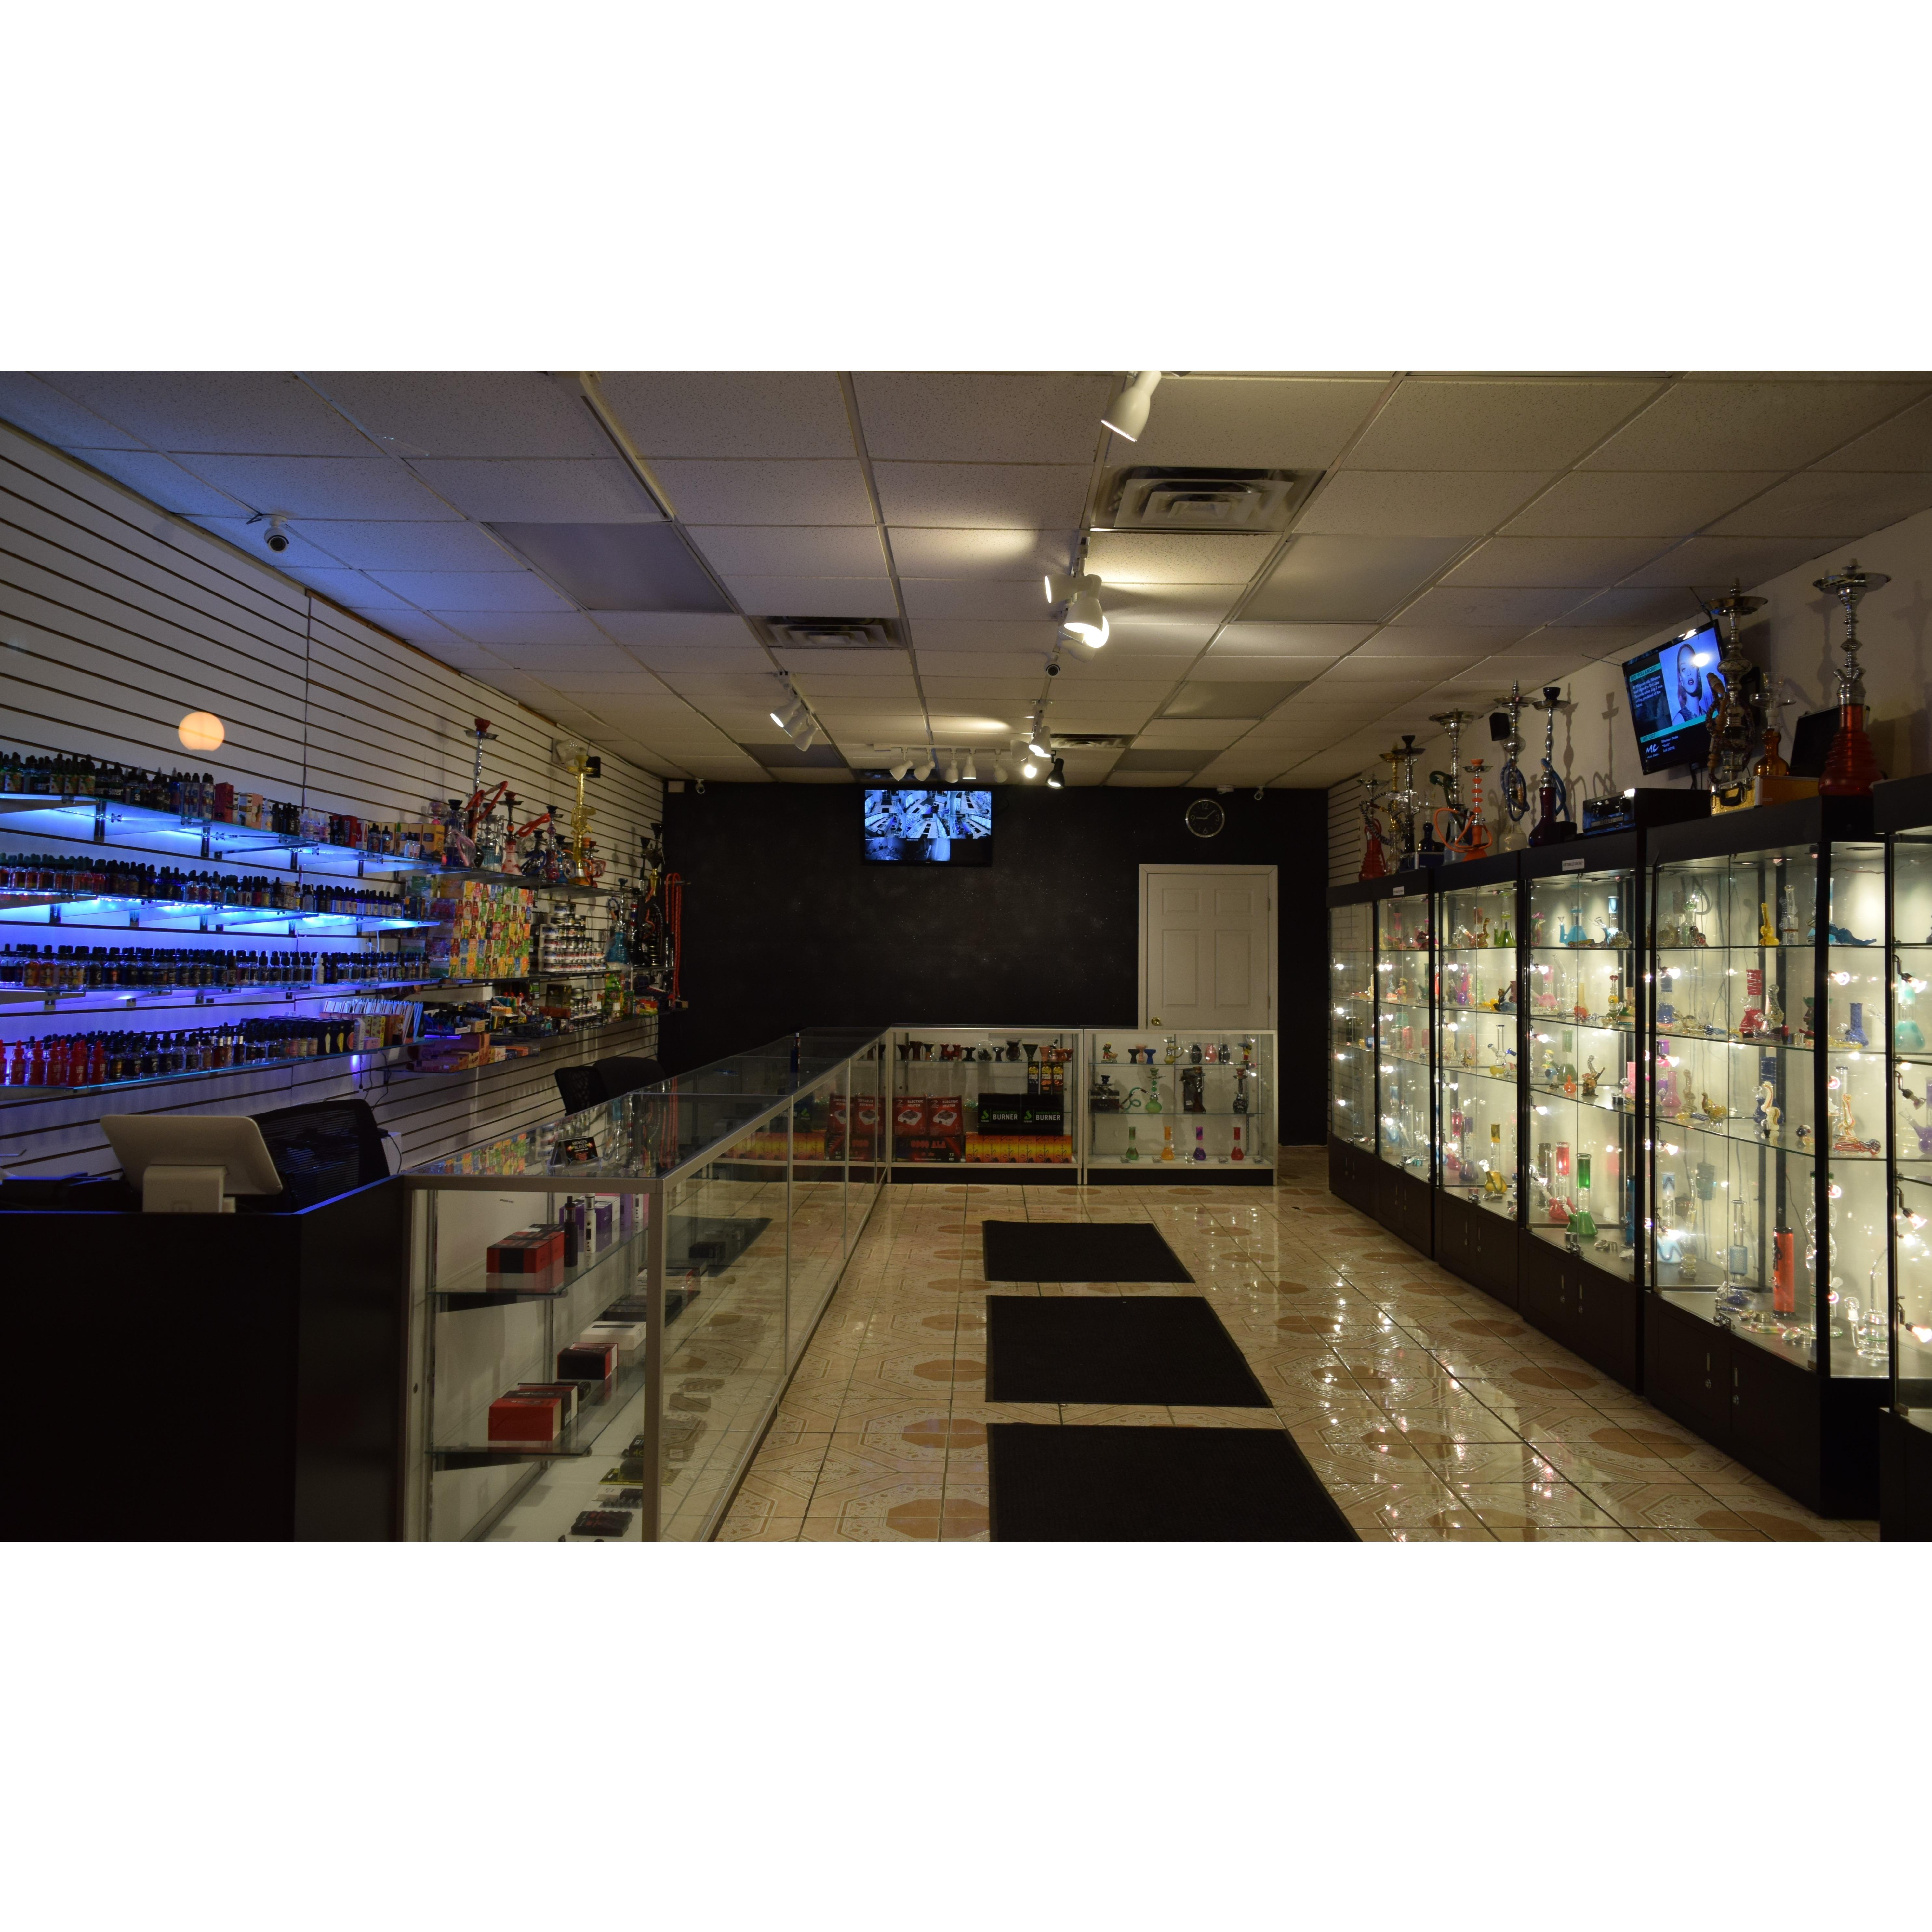 Smoker's Heaven Smoke & Vape Shop